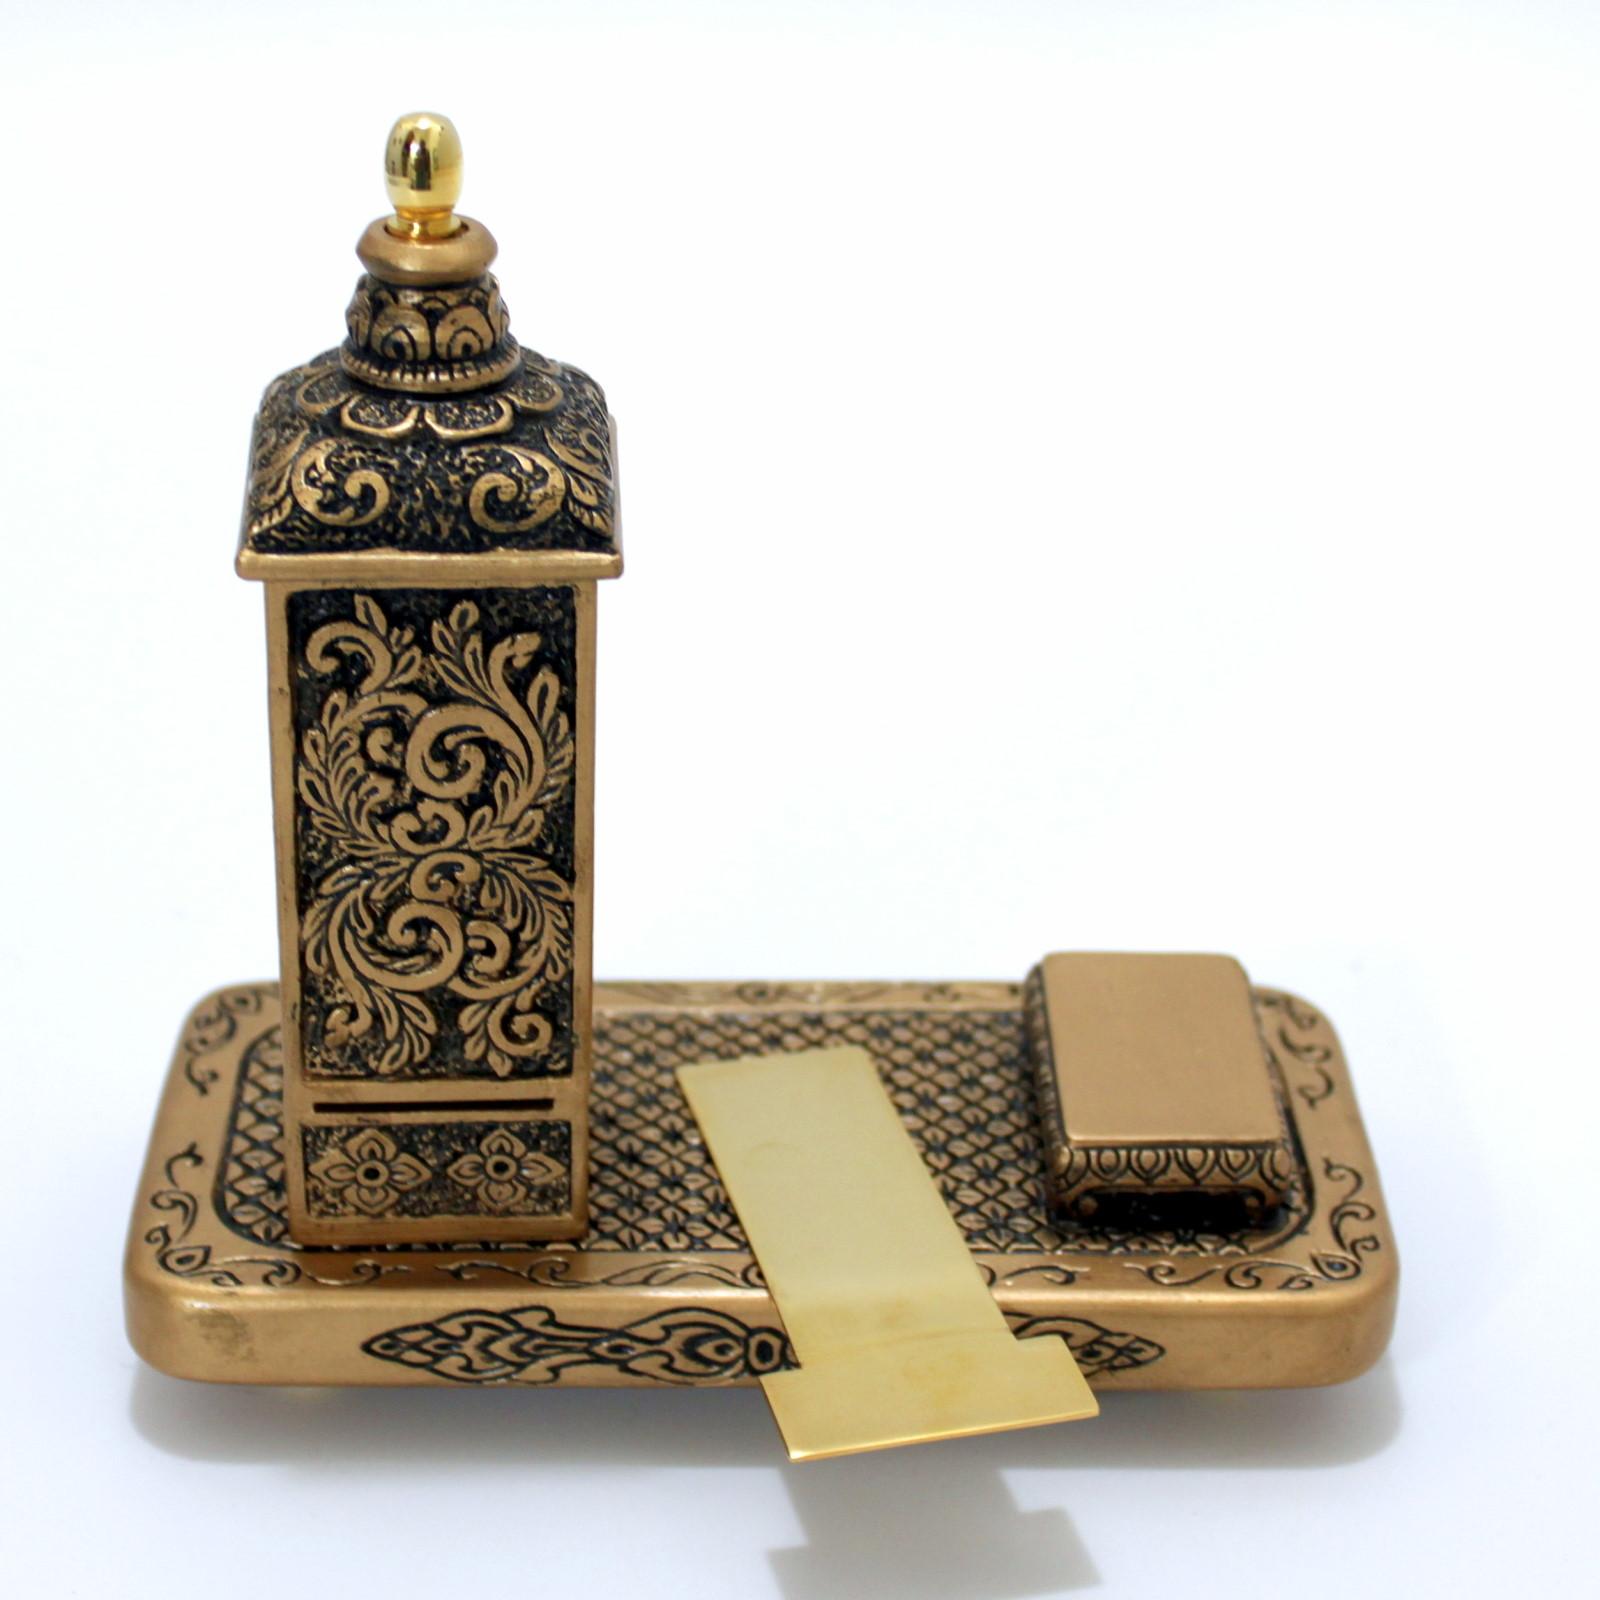 Majestic Die Penetration (Simon Corneille) by Magic Wagon